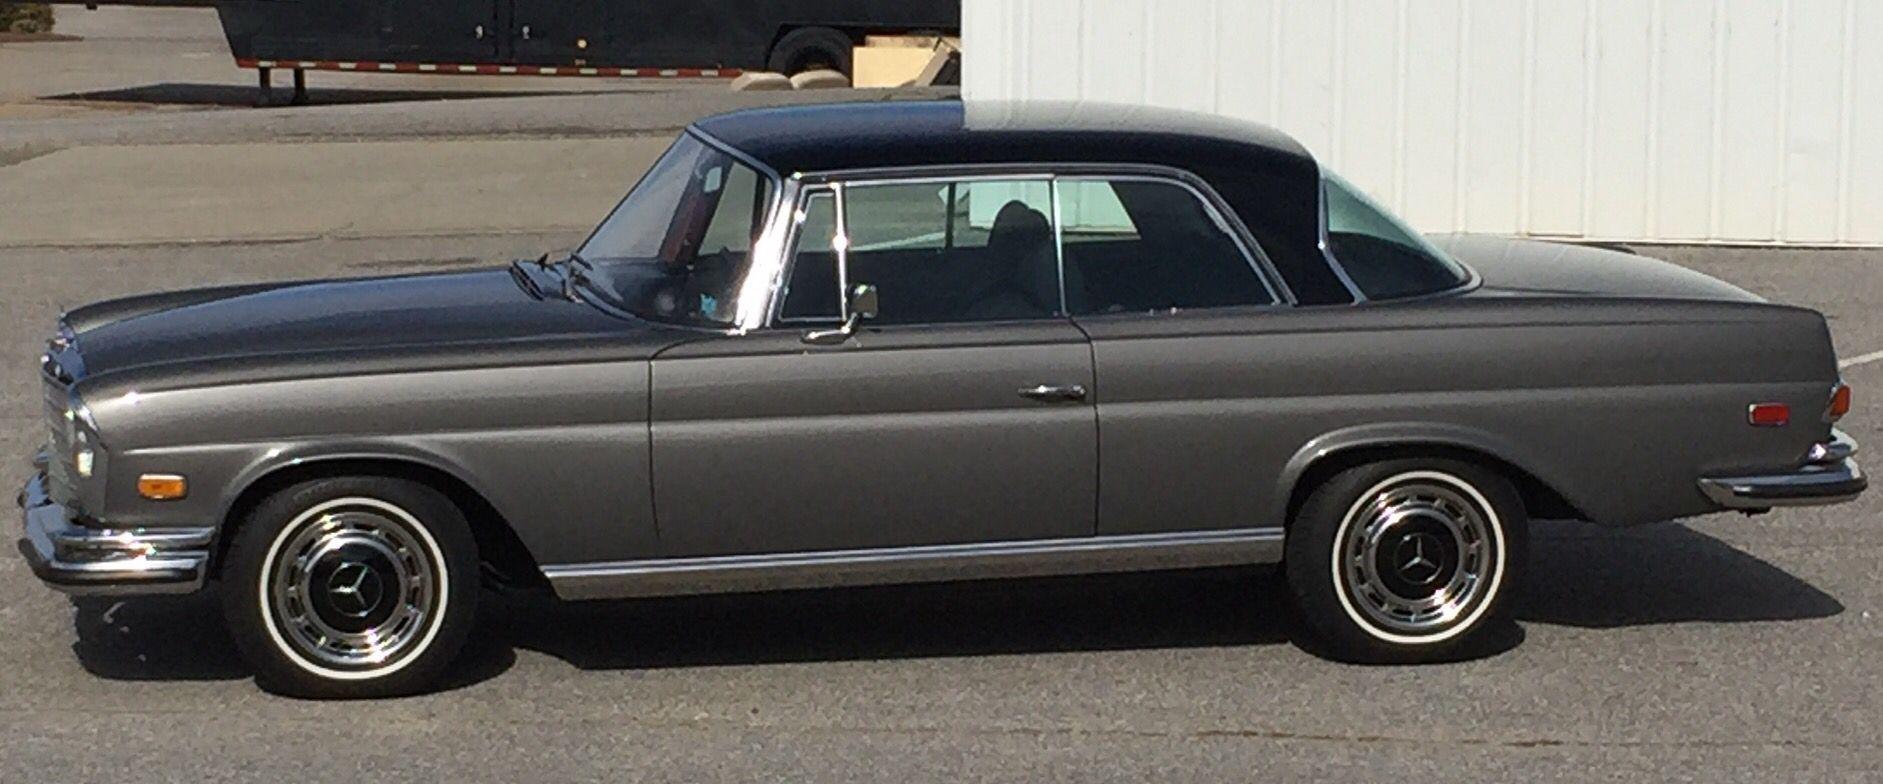 1970 mercedes benz 280se 3 5 anthracite metallic with for 1970 mercedes benz 280se